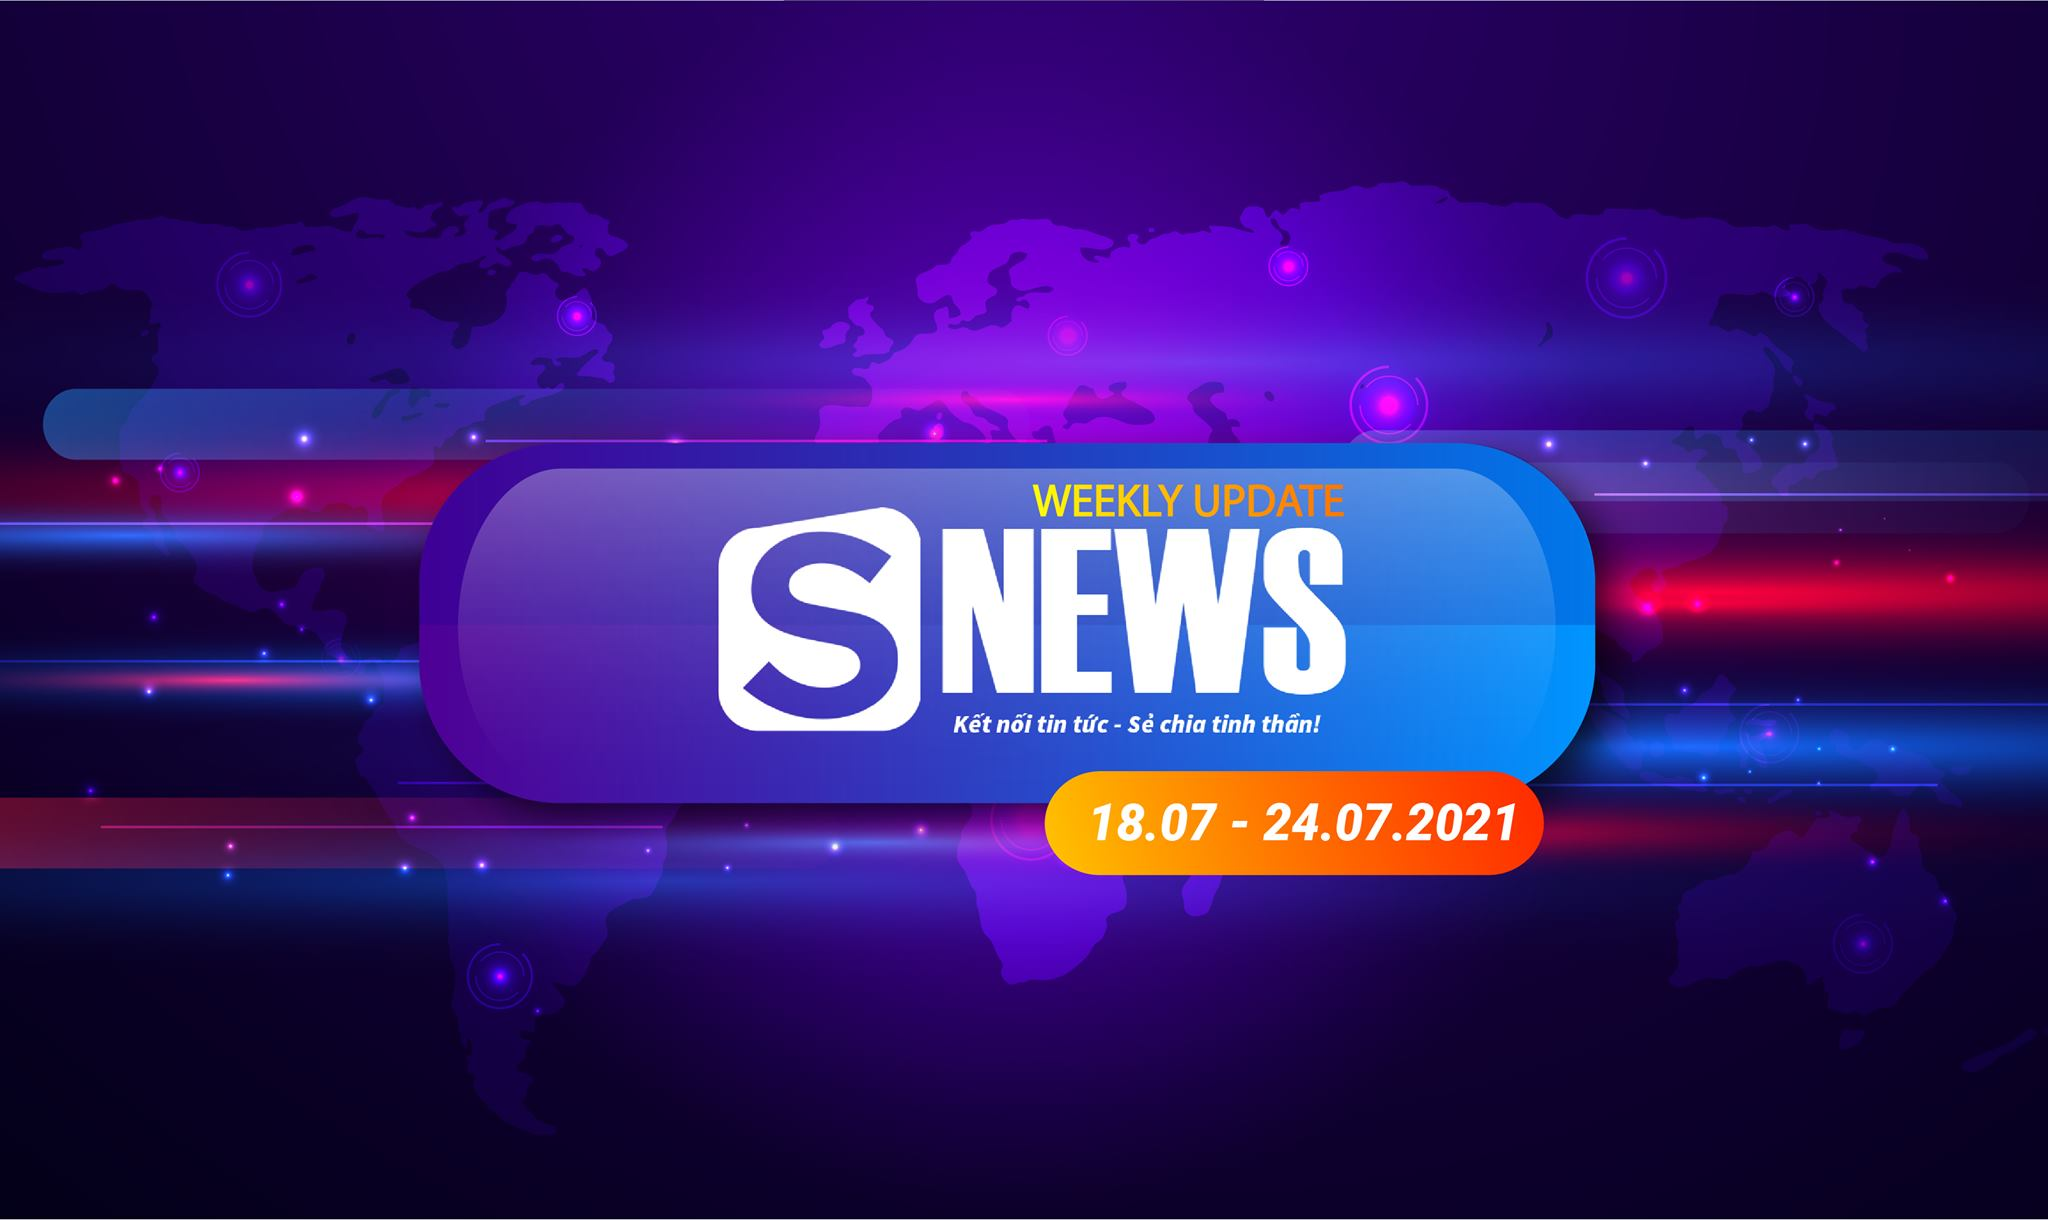 Tổng hợp tin tức Sapo tuần qua: 18.07 - 24.07.2021